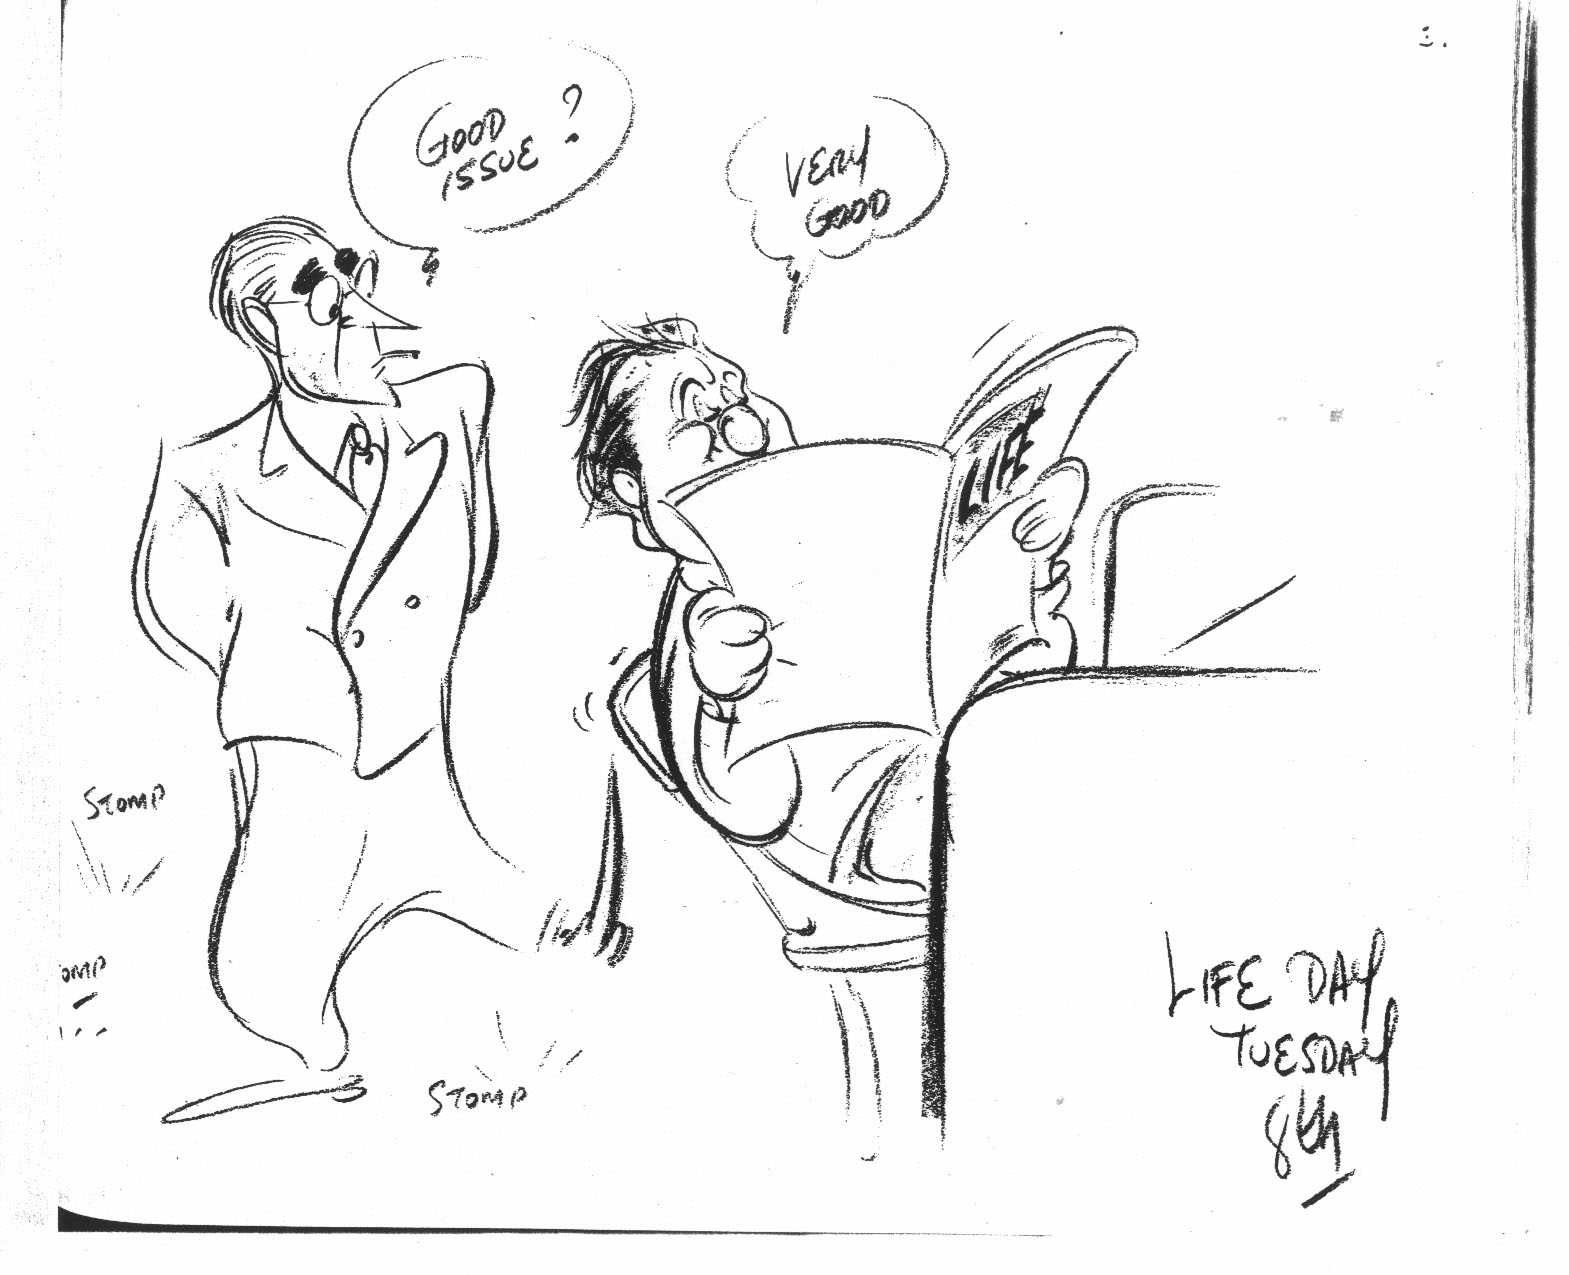 Filboid Studge: Irv Spence's Cartoon Diary: February 8, 1944